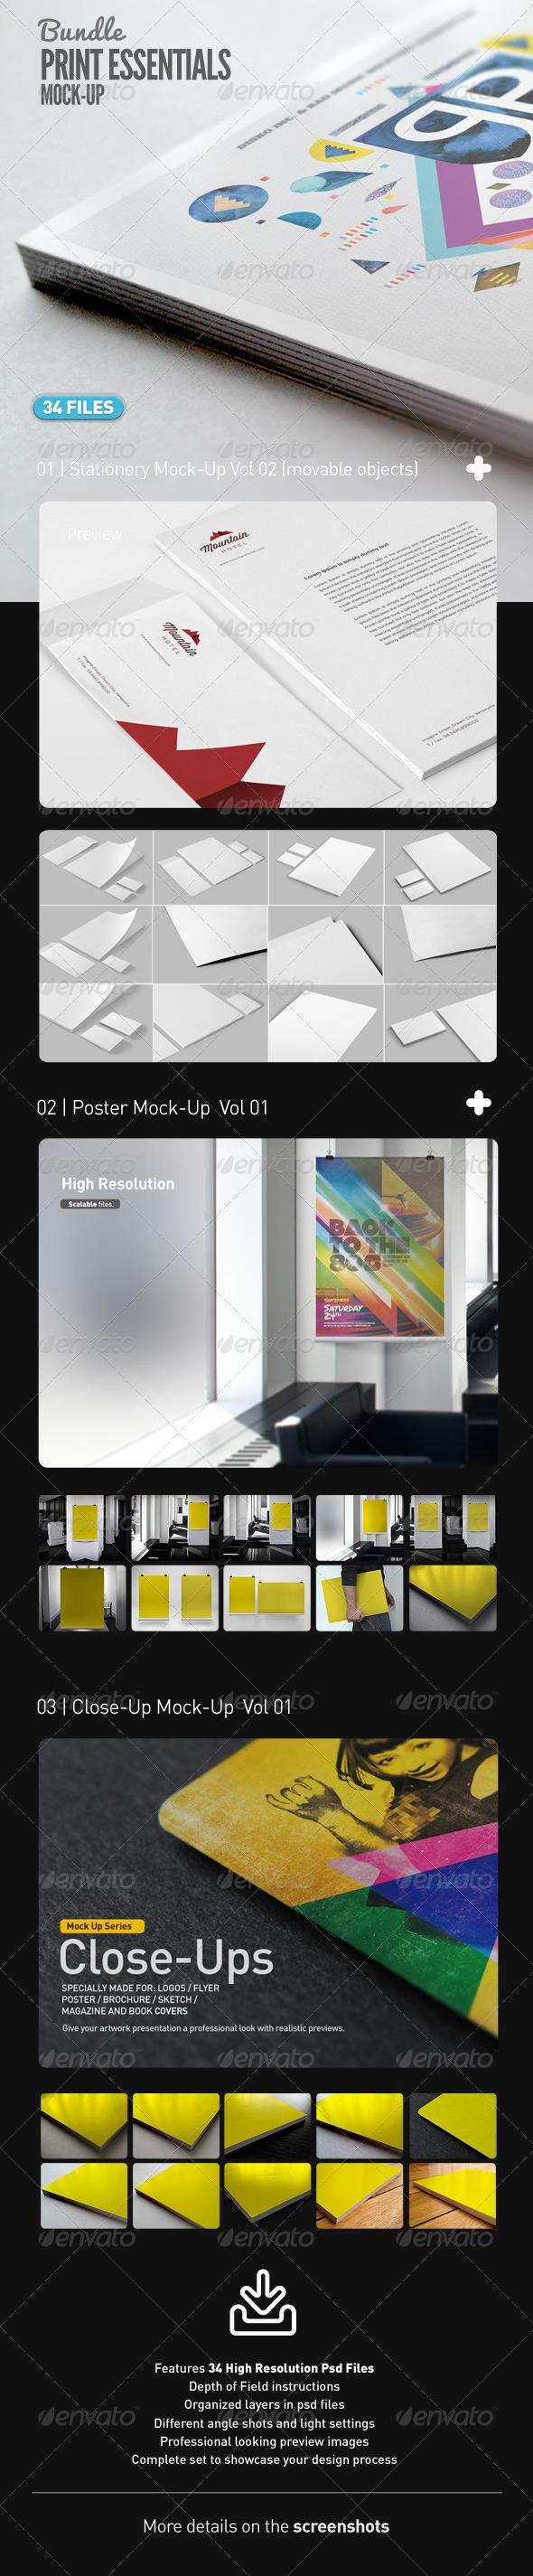 Stationery Poster Close Up Mock-Up Bundle Vol 01 - Print Product Mock-Ups